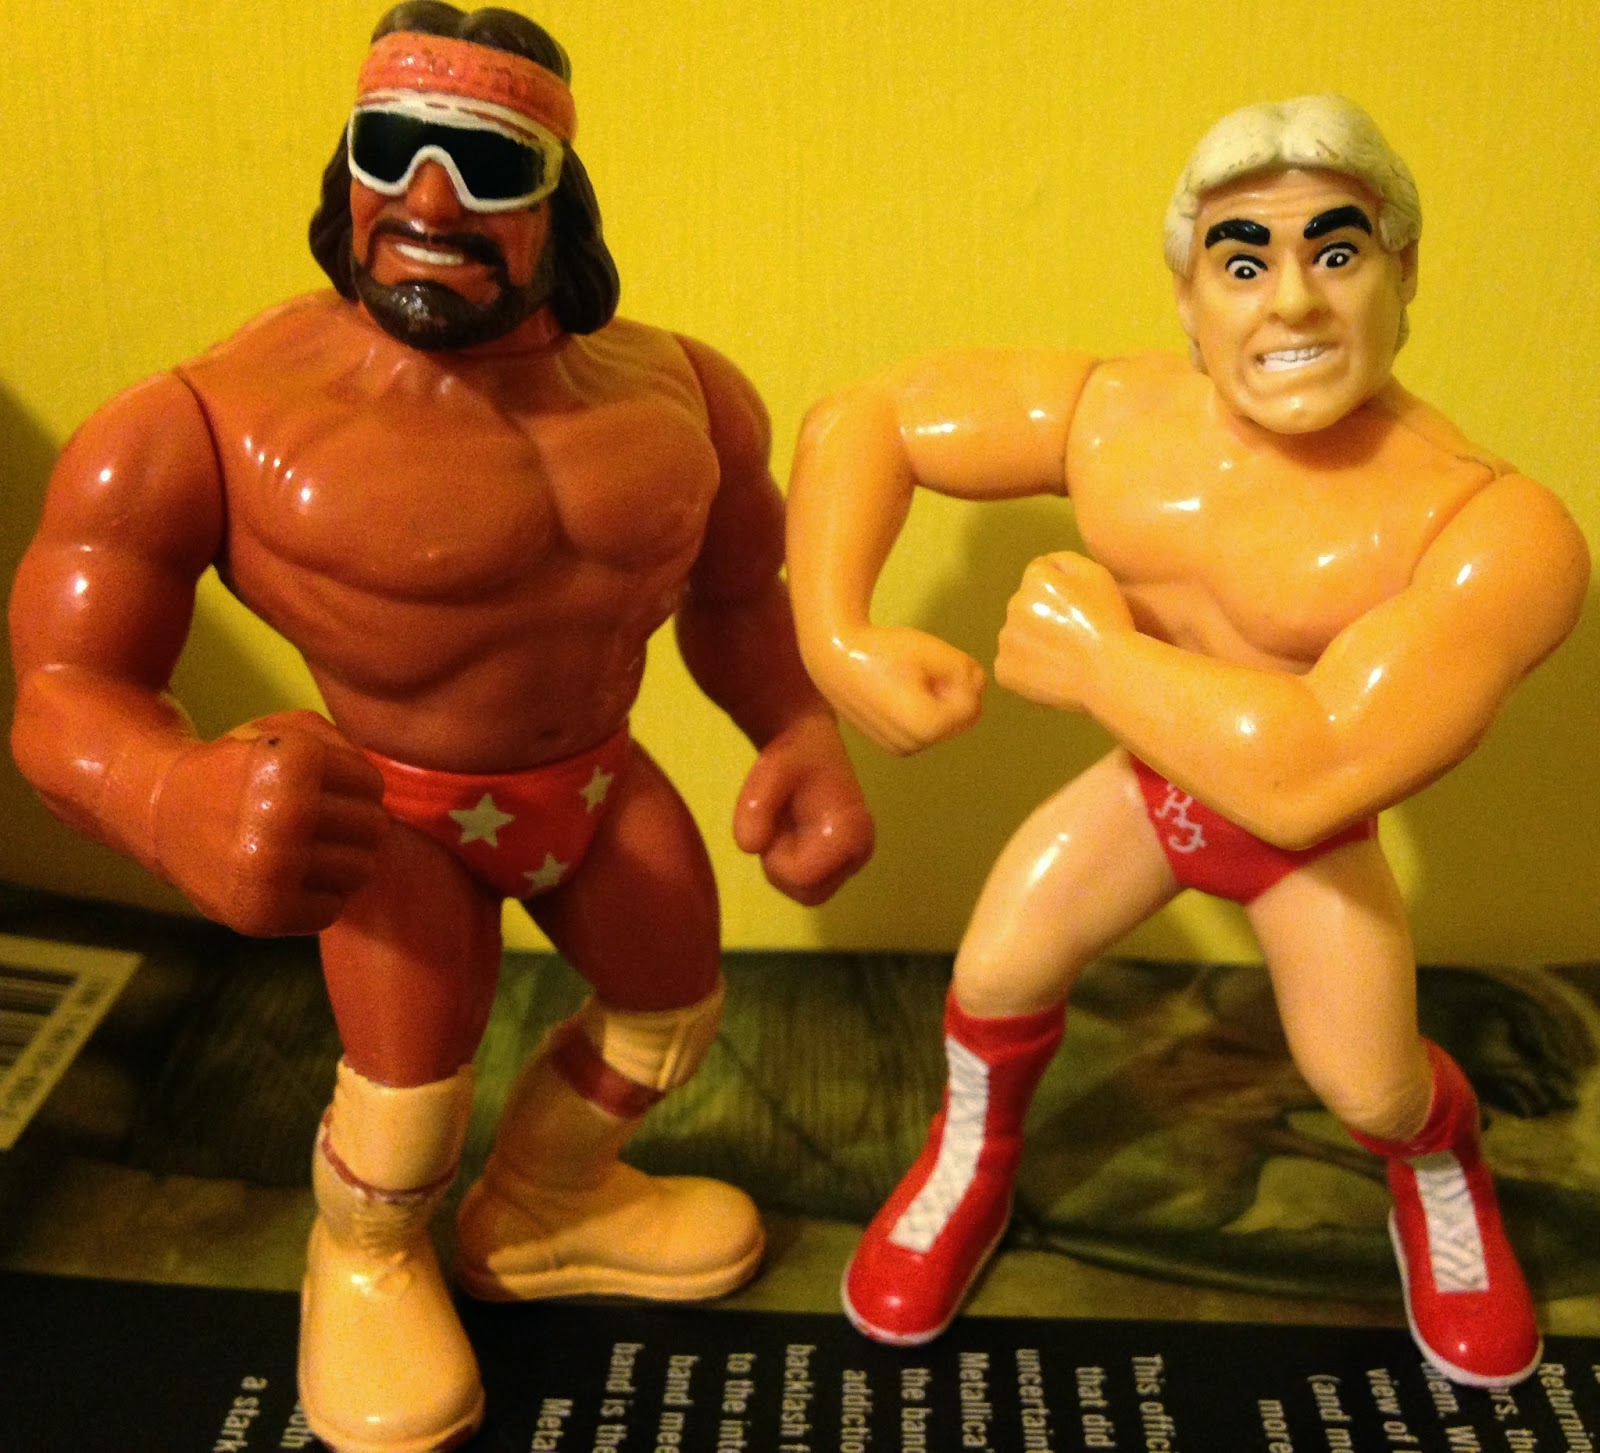 WWF / WWE - Hasbro Wrestling Figures - Macho Man Randy Savage vs.Ric Flair - Wrestlemania 8